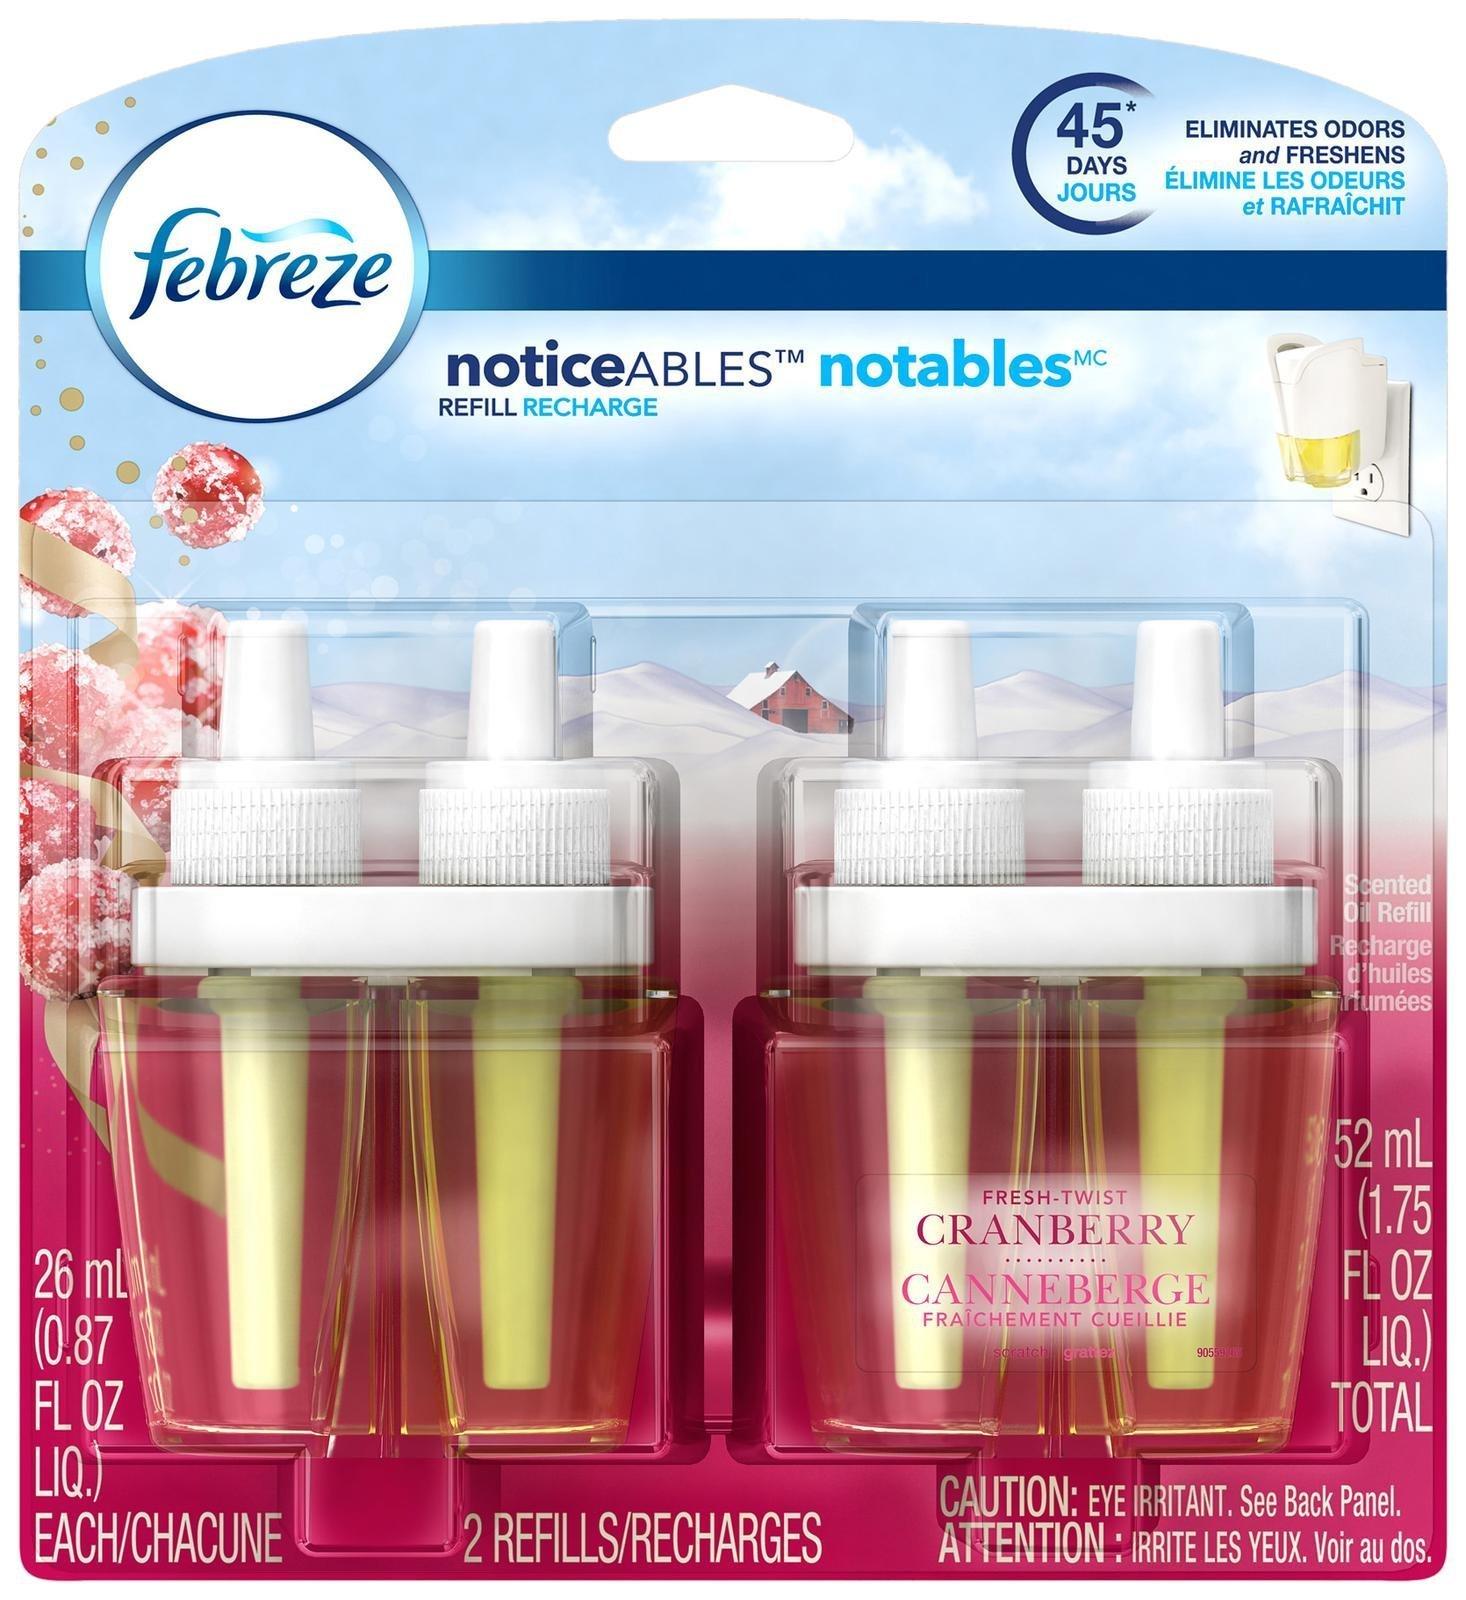 Febreze Noticeable Fresh Twist Cranberry Dual Oil Refill Air Freshener (2 Count, 1.75 Oz), 0.11 Pound